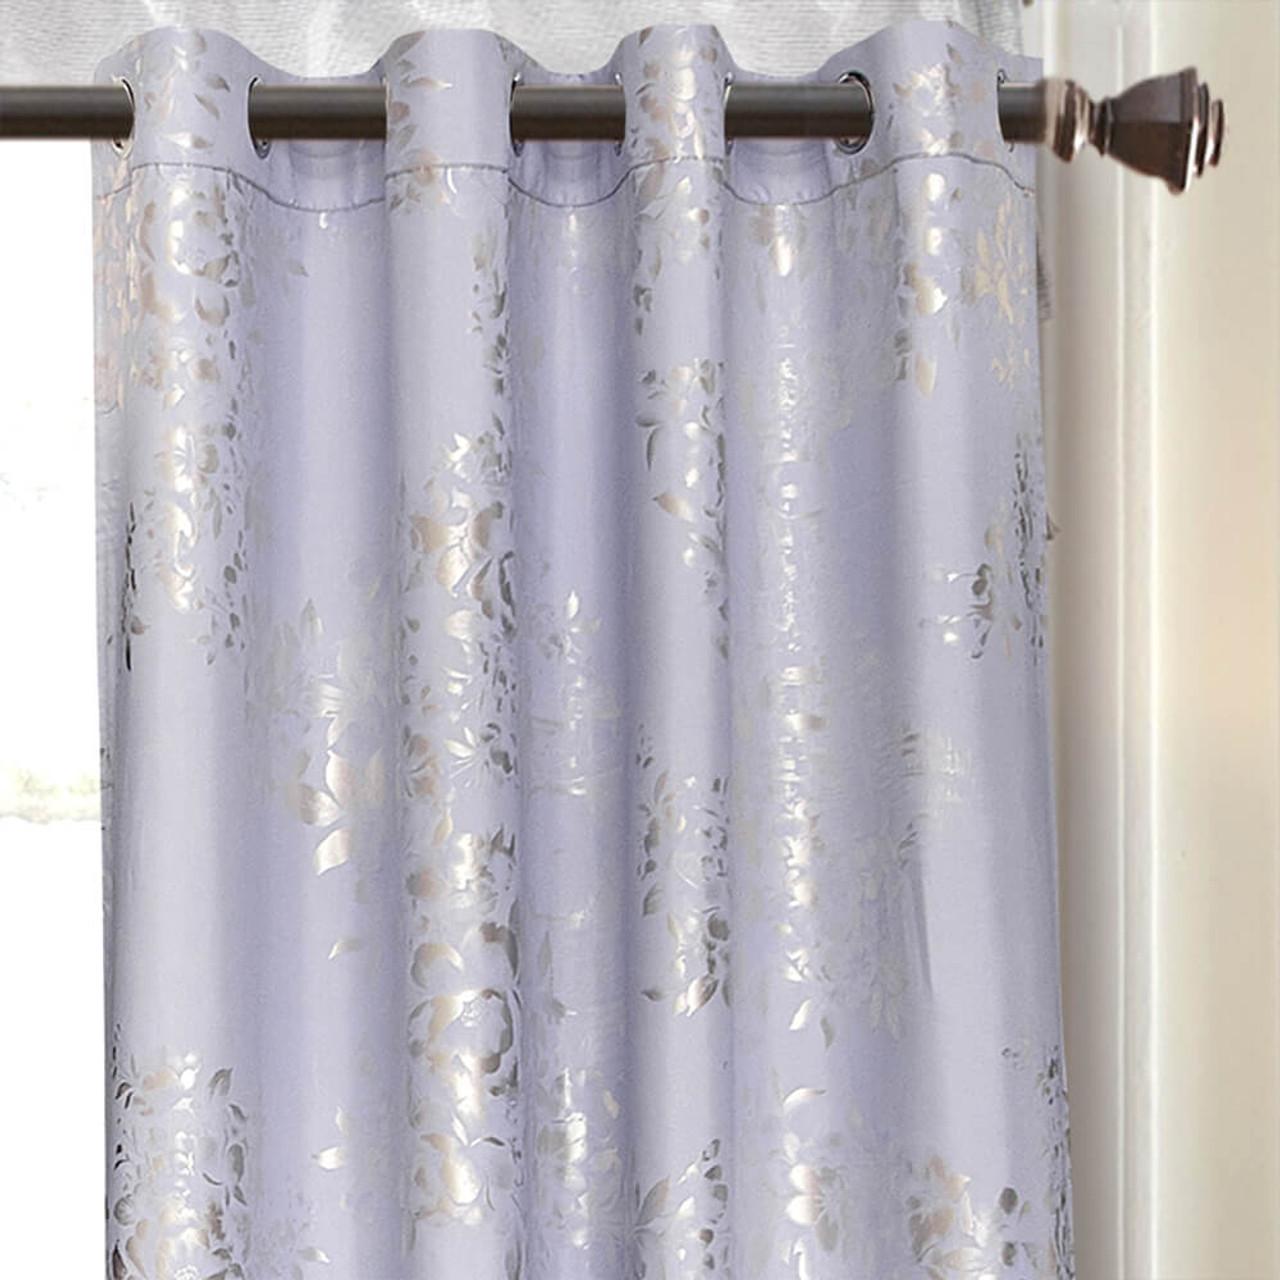 Drop-Shipping Curtain Panel Semi-Blackout Drapes, DMC720